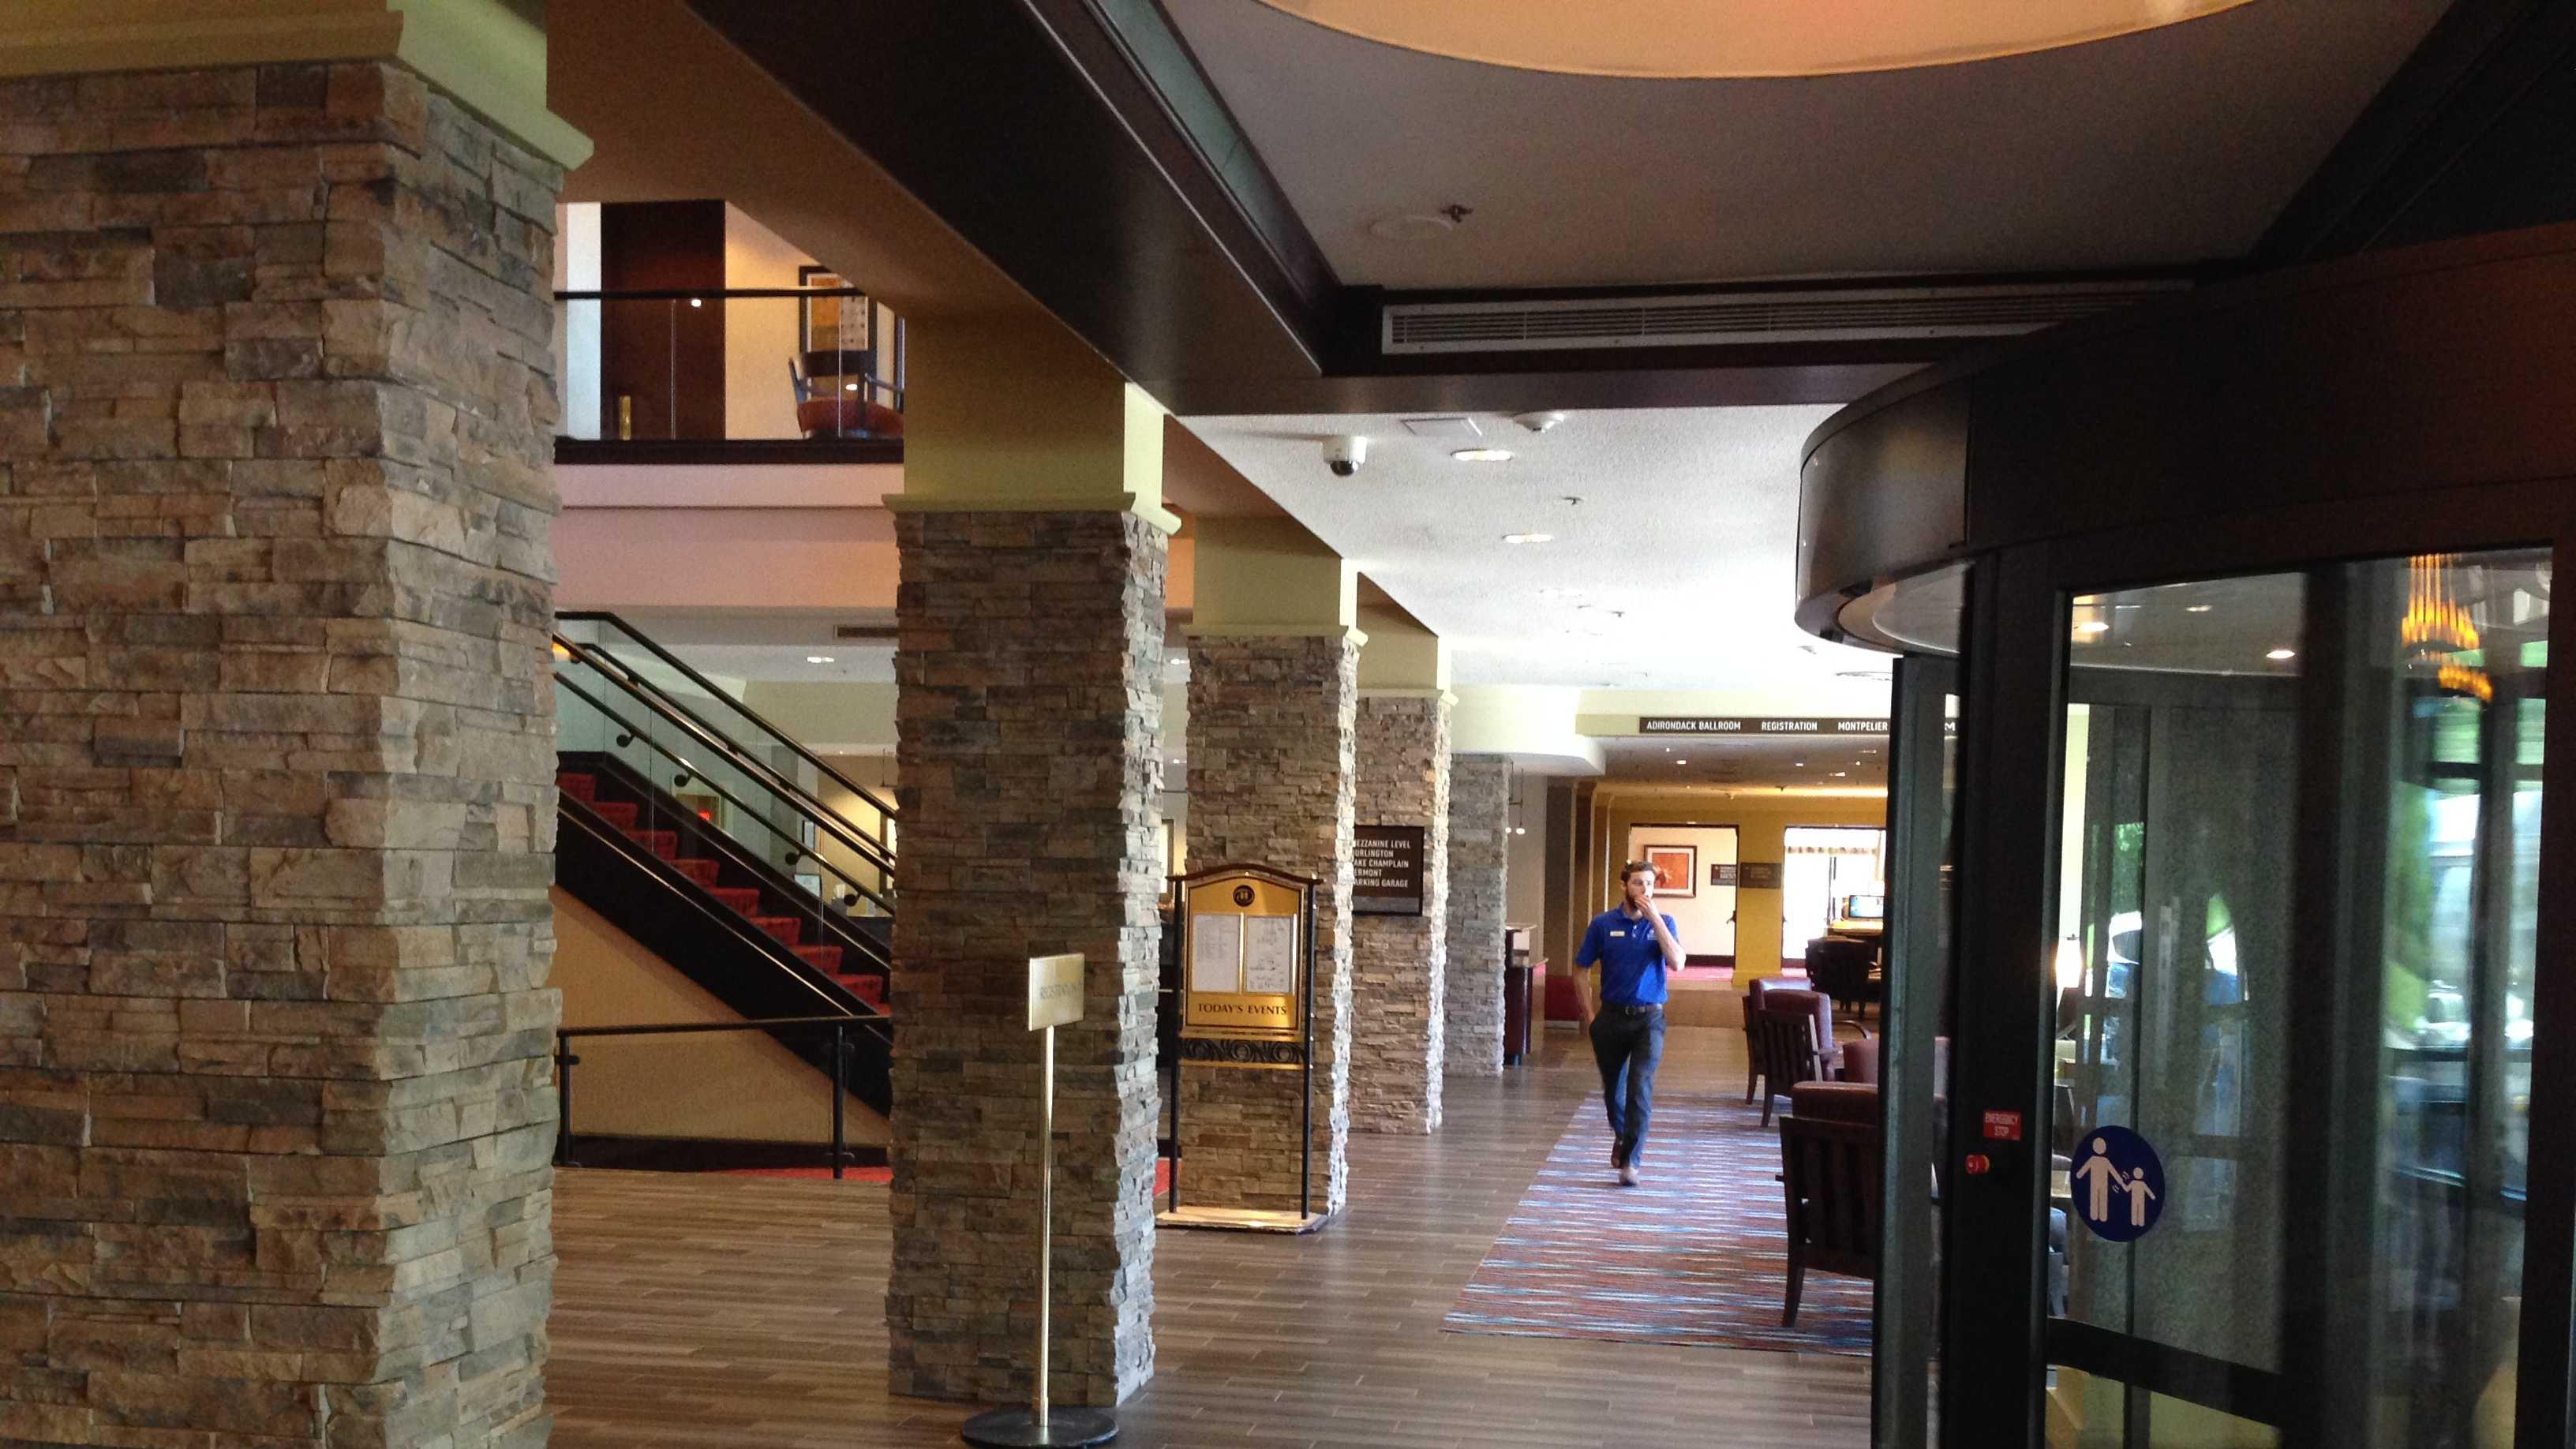 The new lobby redesign at the Hilton Burlington Hotel.